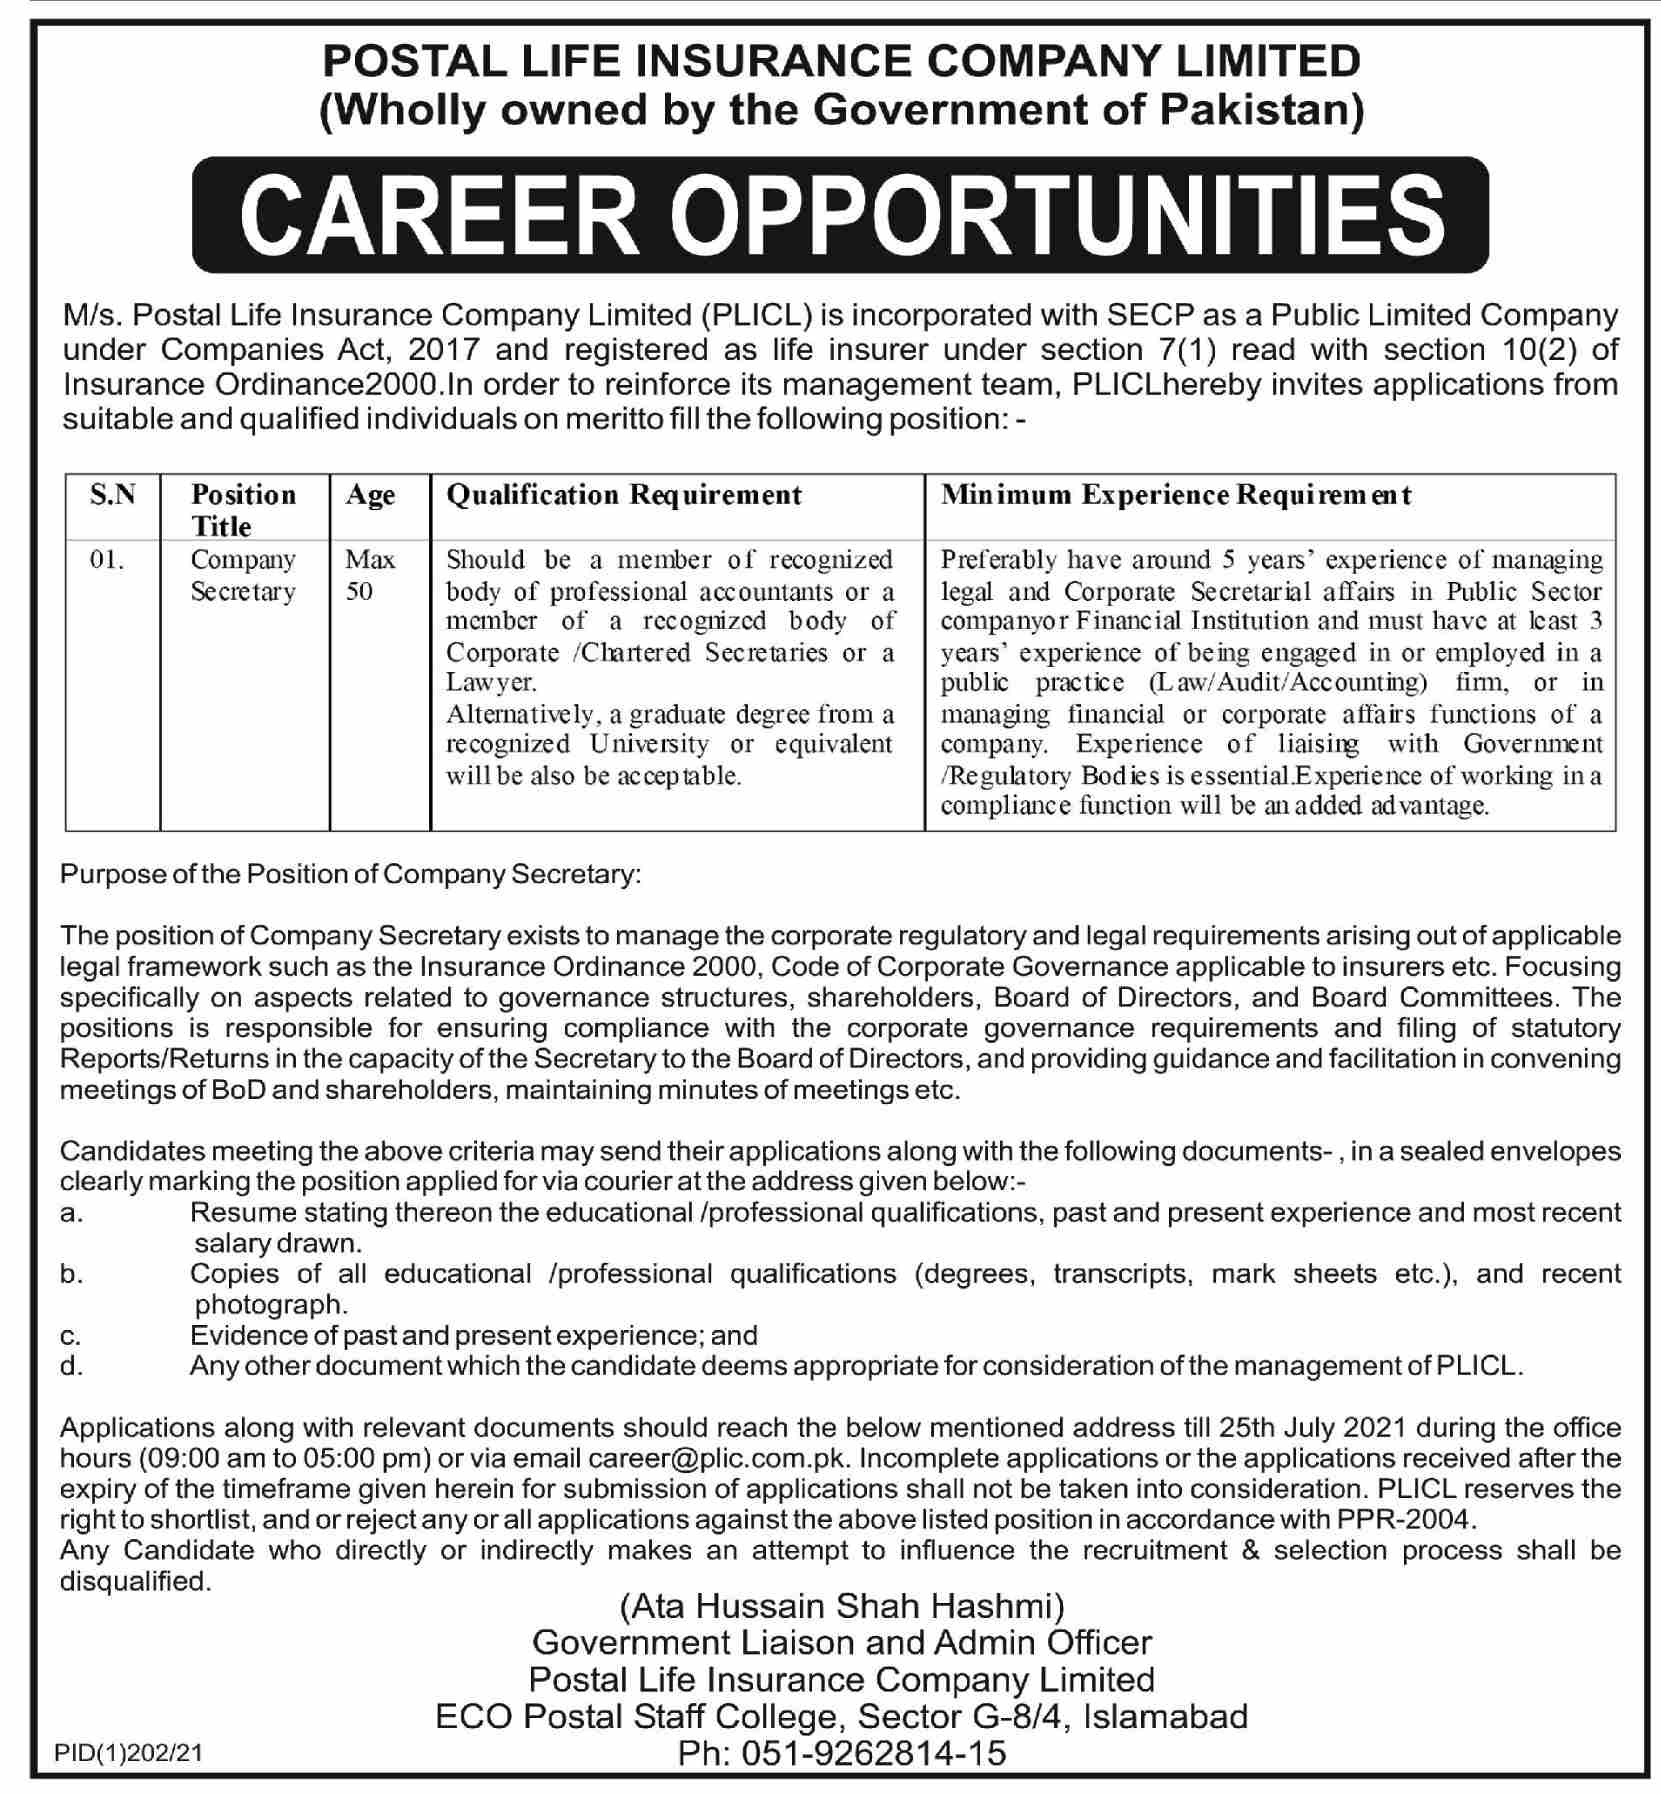 Postal Life Insurance Company Limited PLICL Jobs 2021 in Pakistan